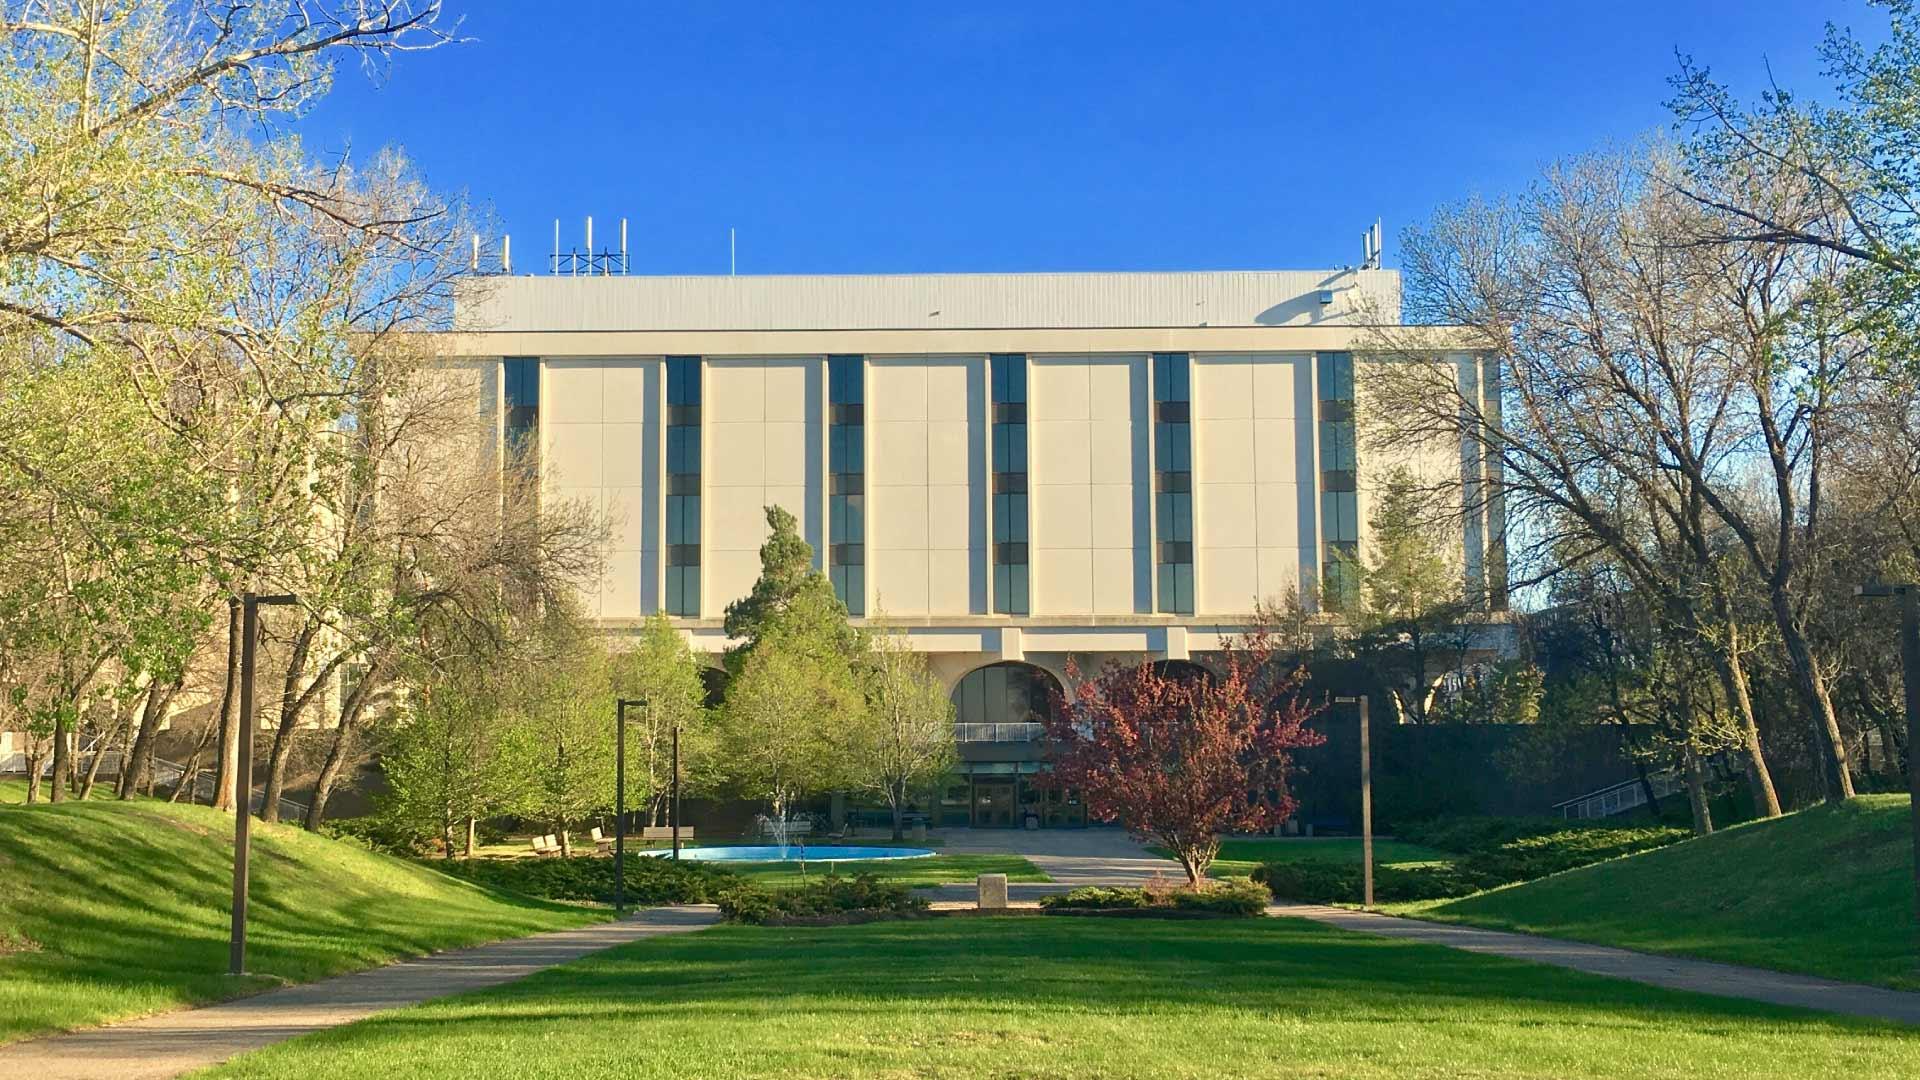 University of Regina building with blue skies